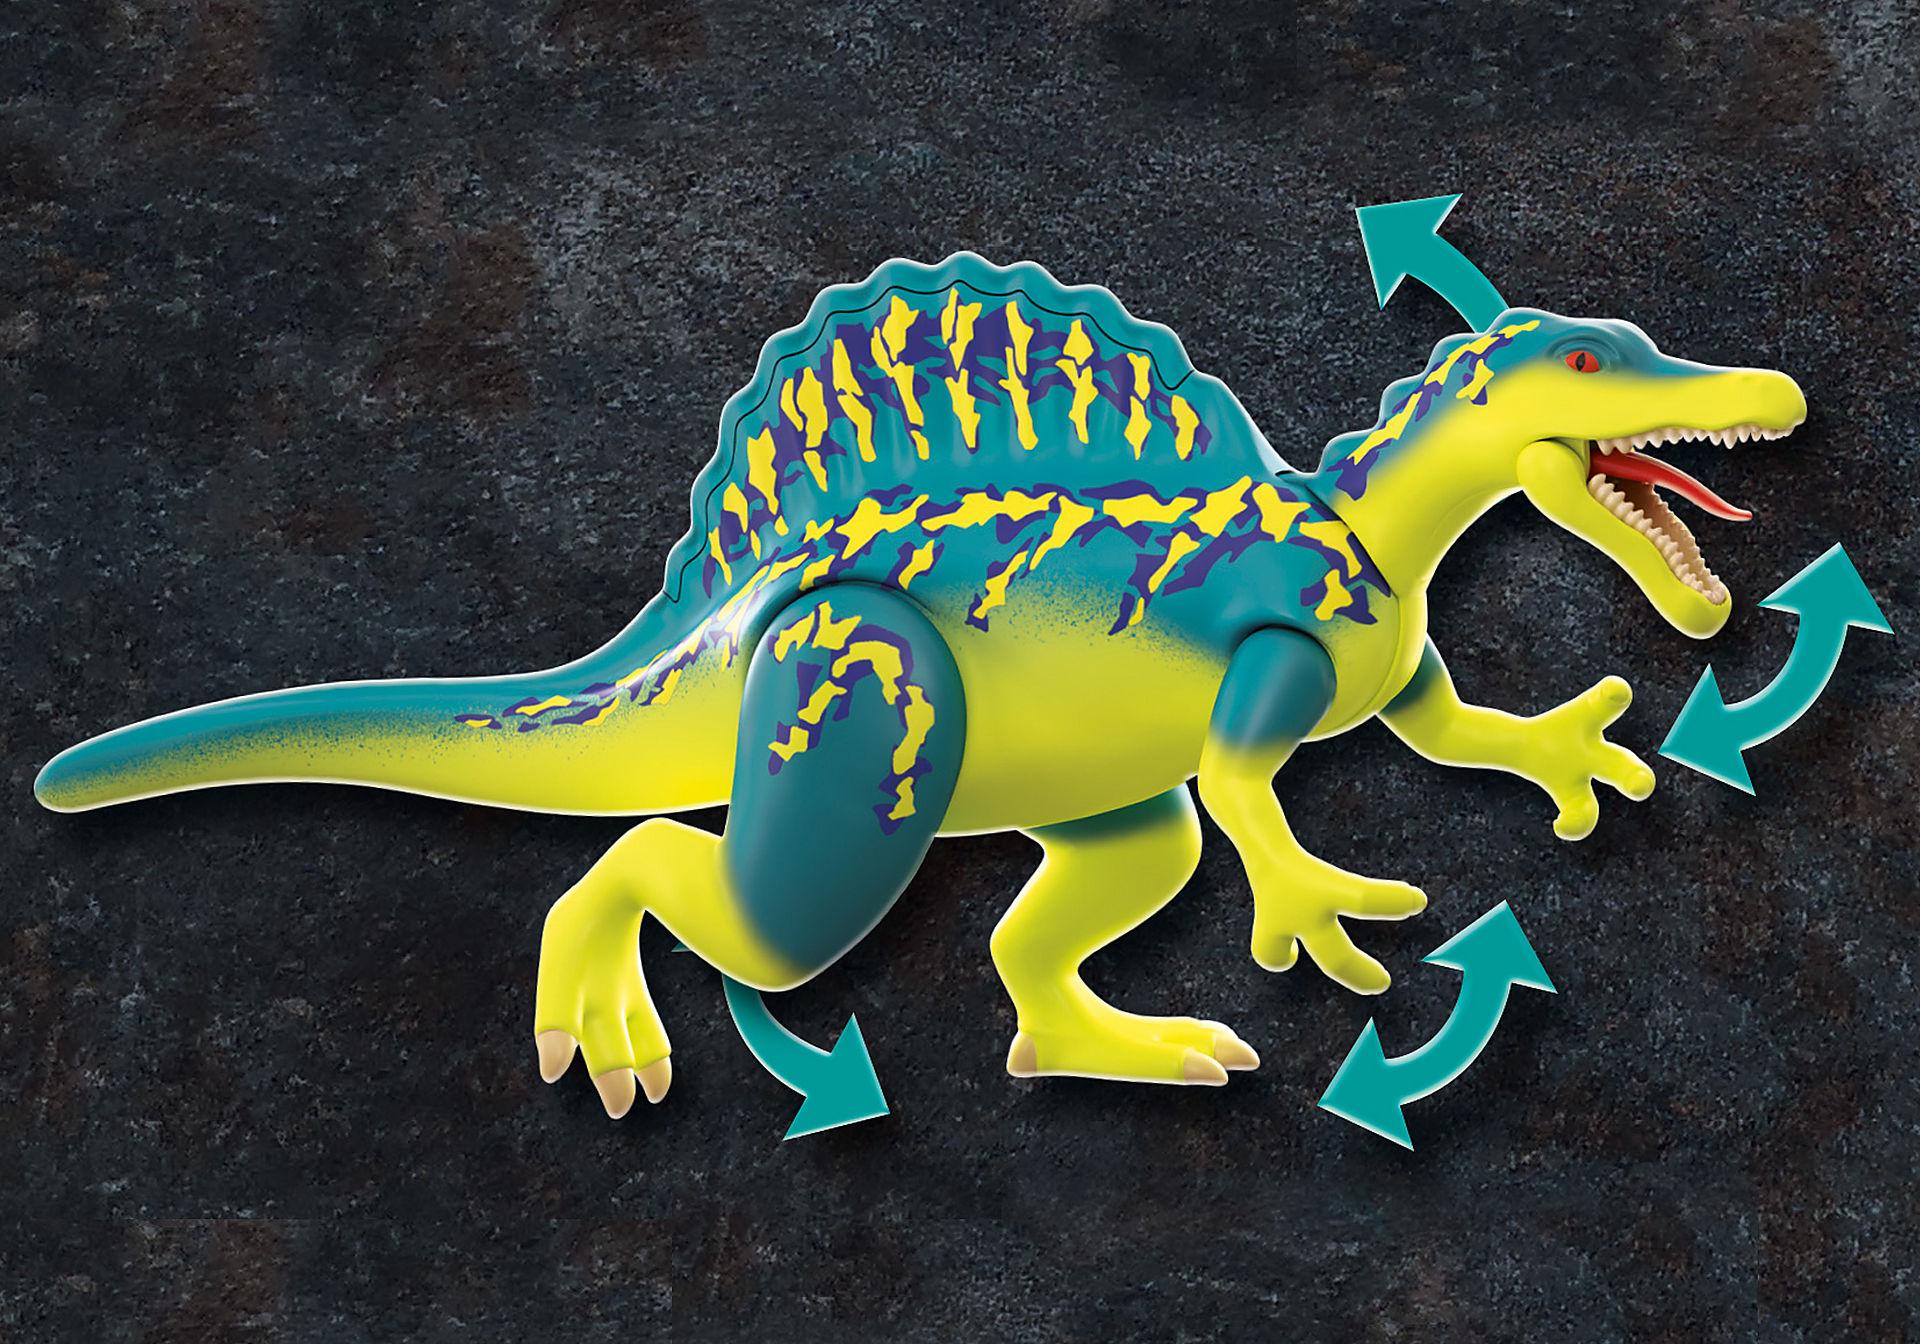 70625 Spinosaurus: Doble poder de defensa zoom image5